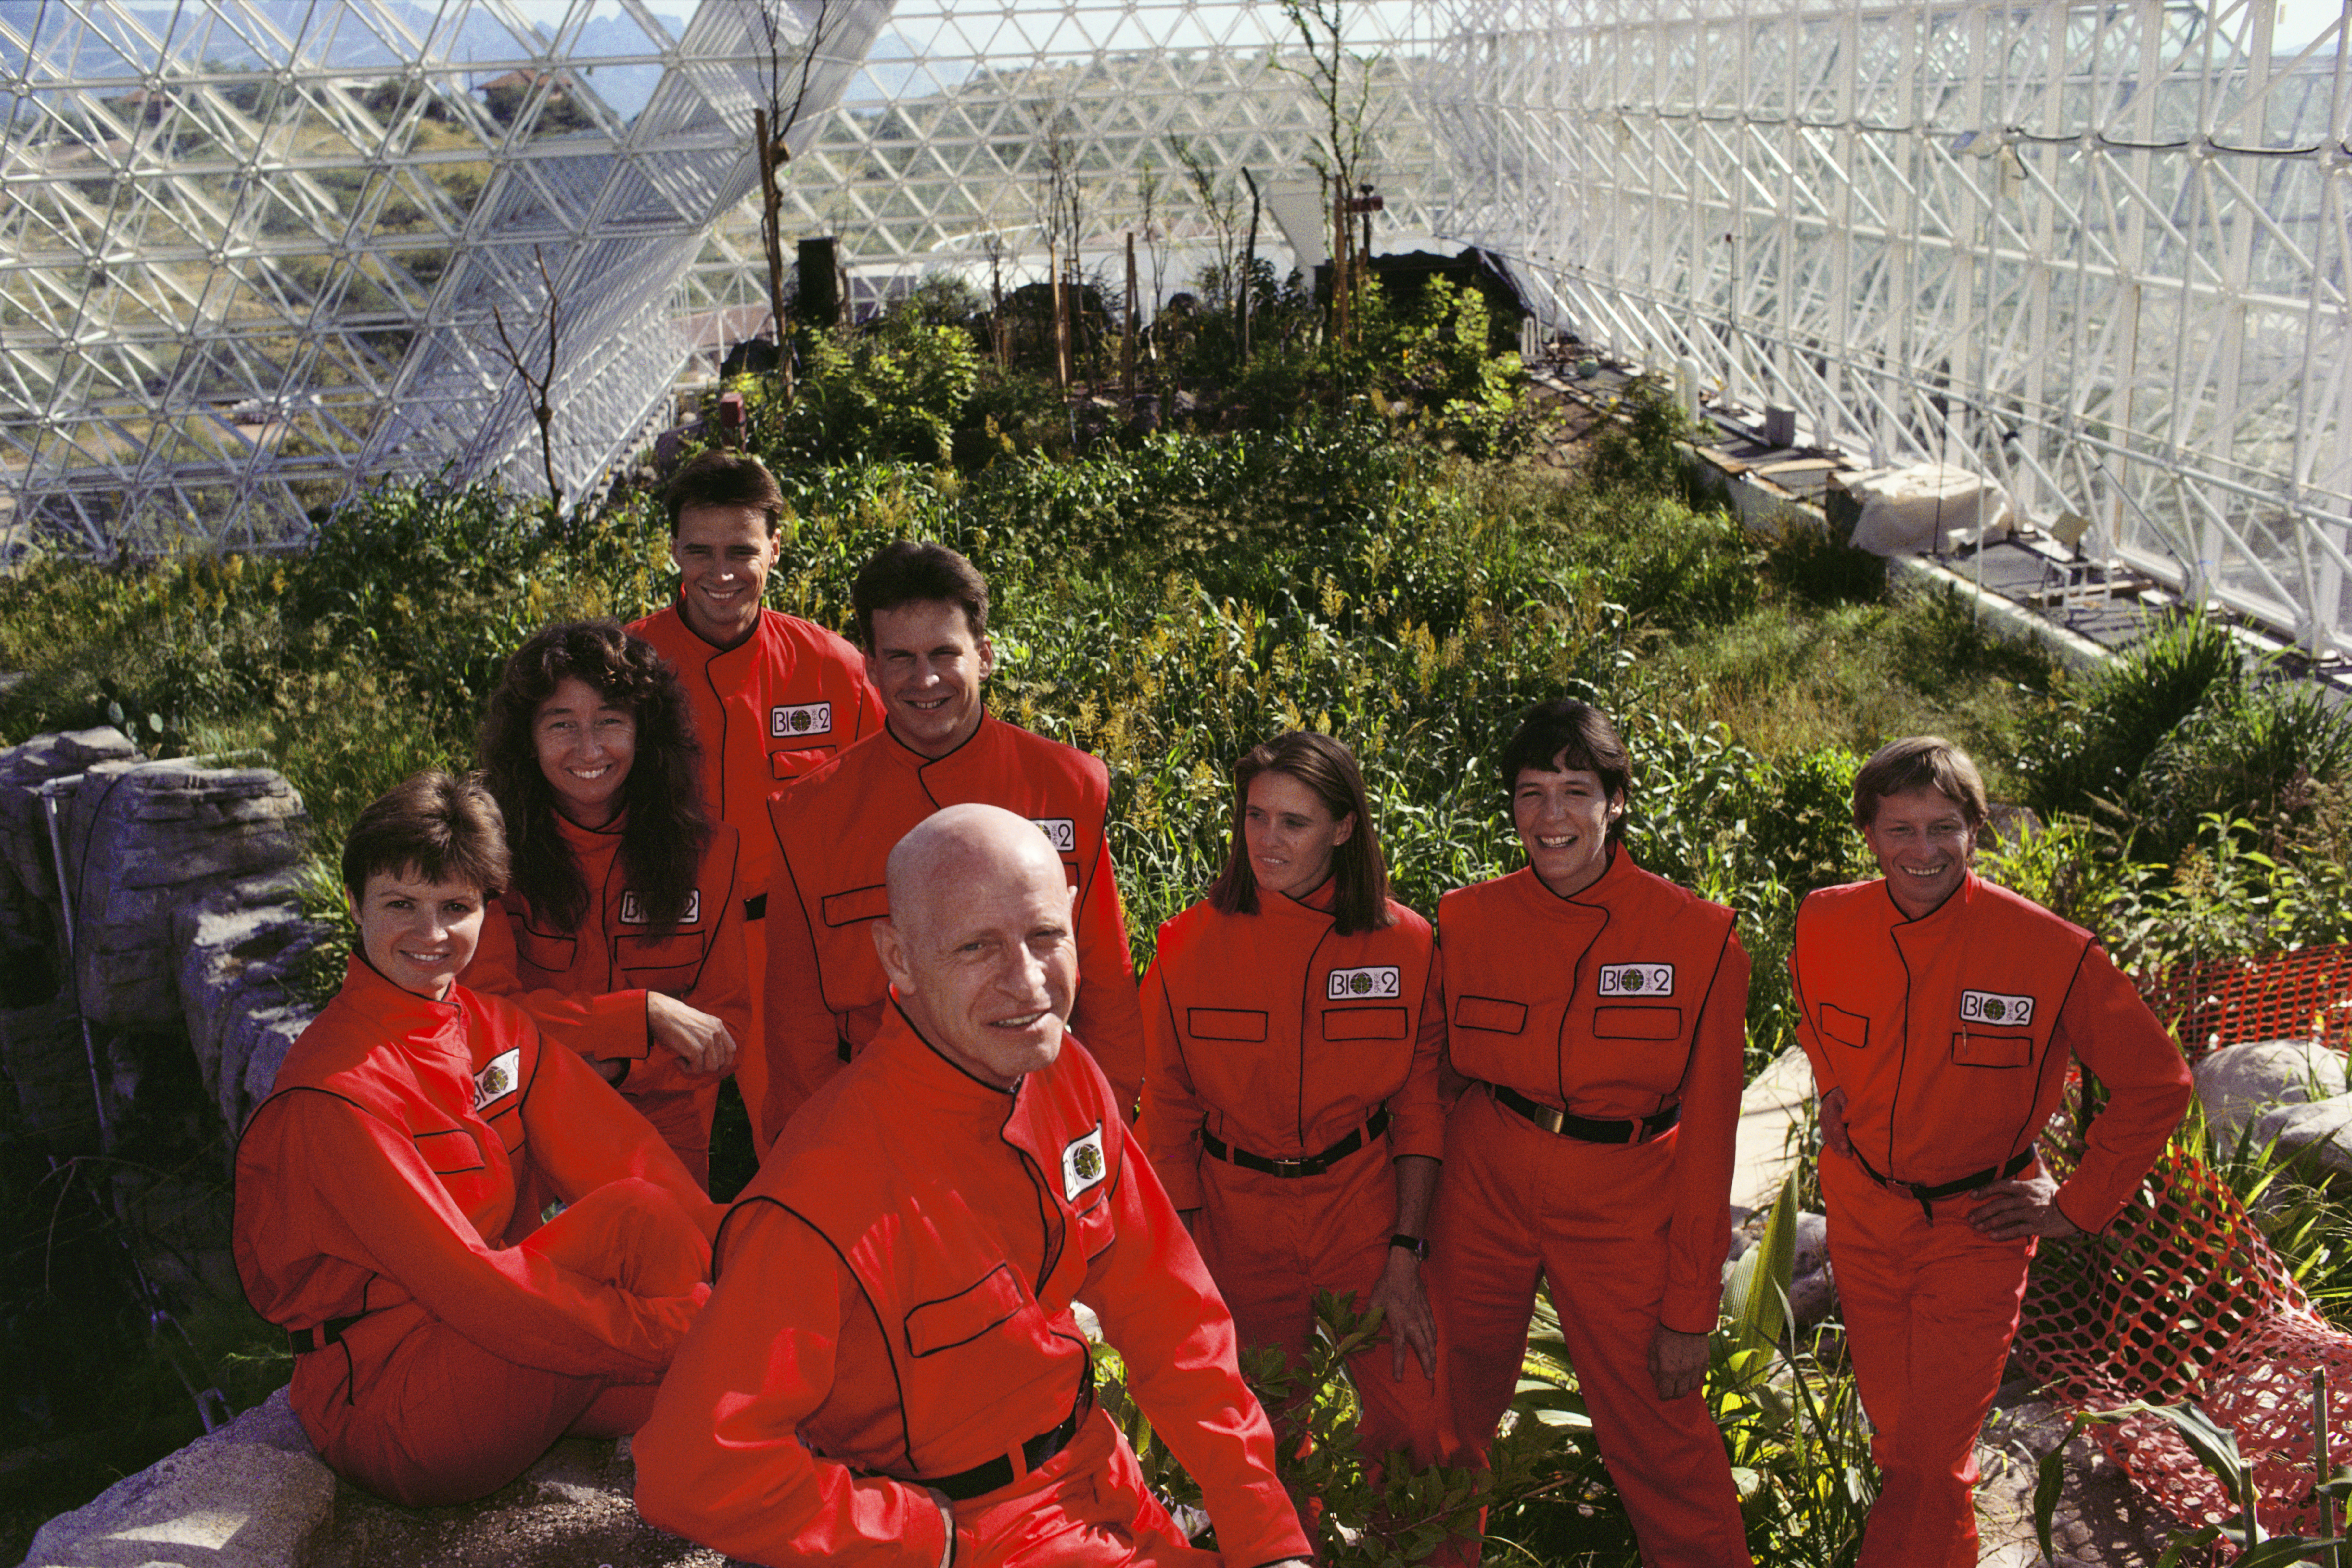 SPACESHIP EARTH_Biosphere 2 Promo Shot (2)_Courtesy of NEON